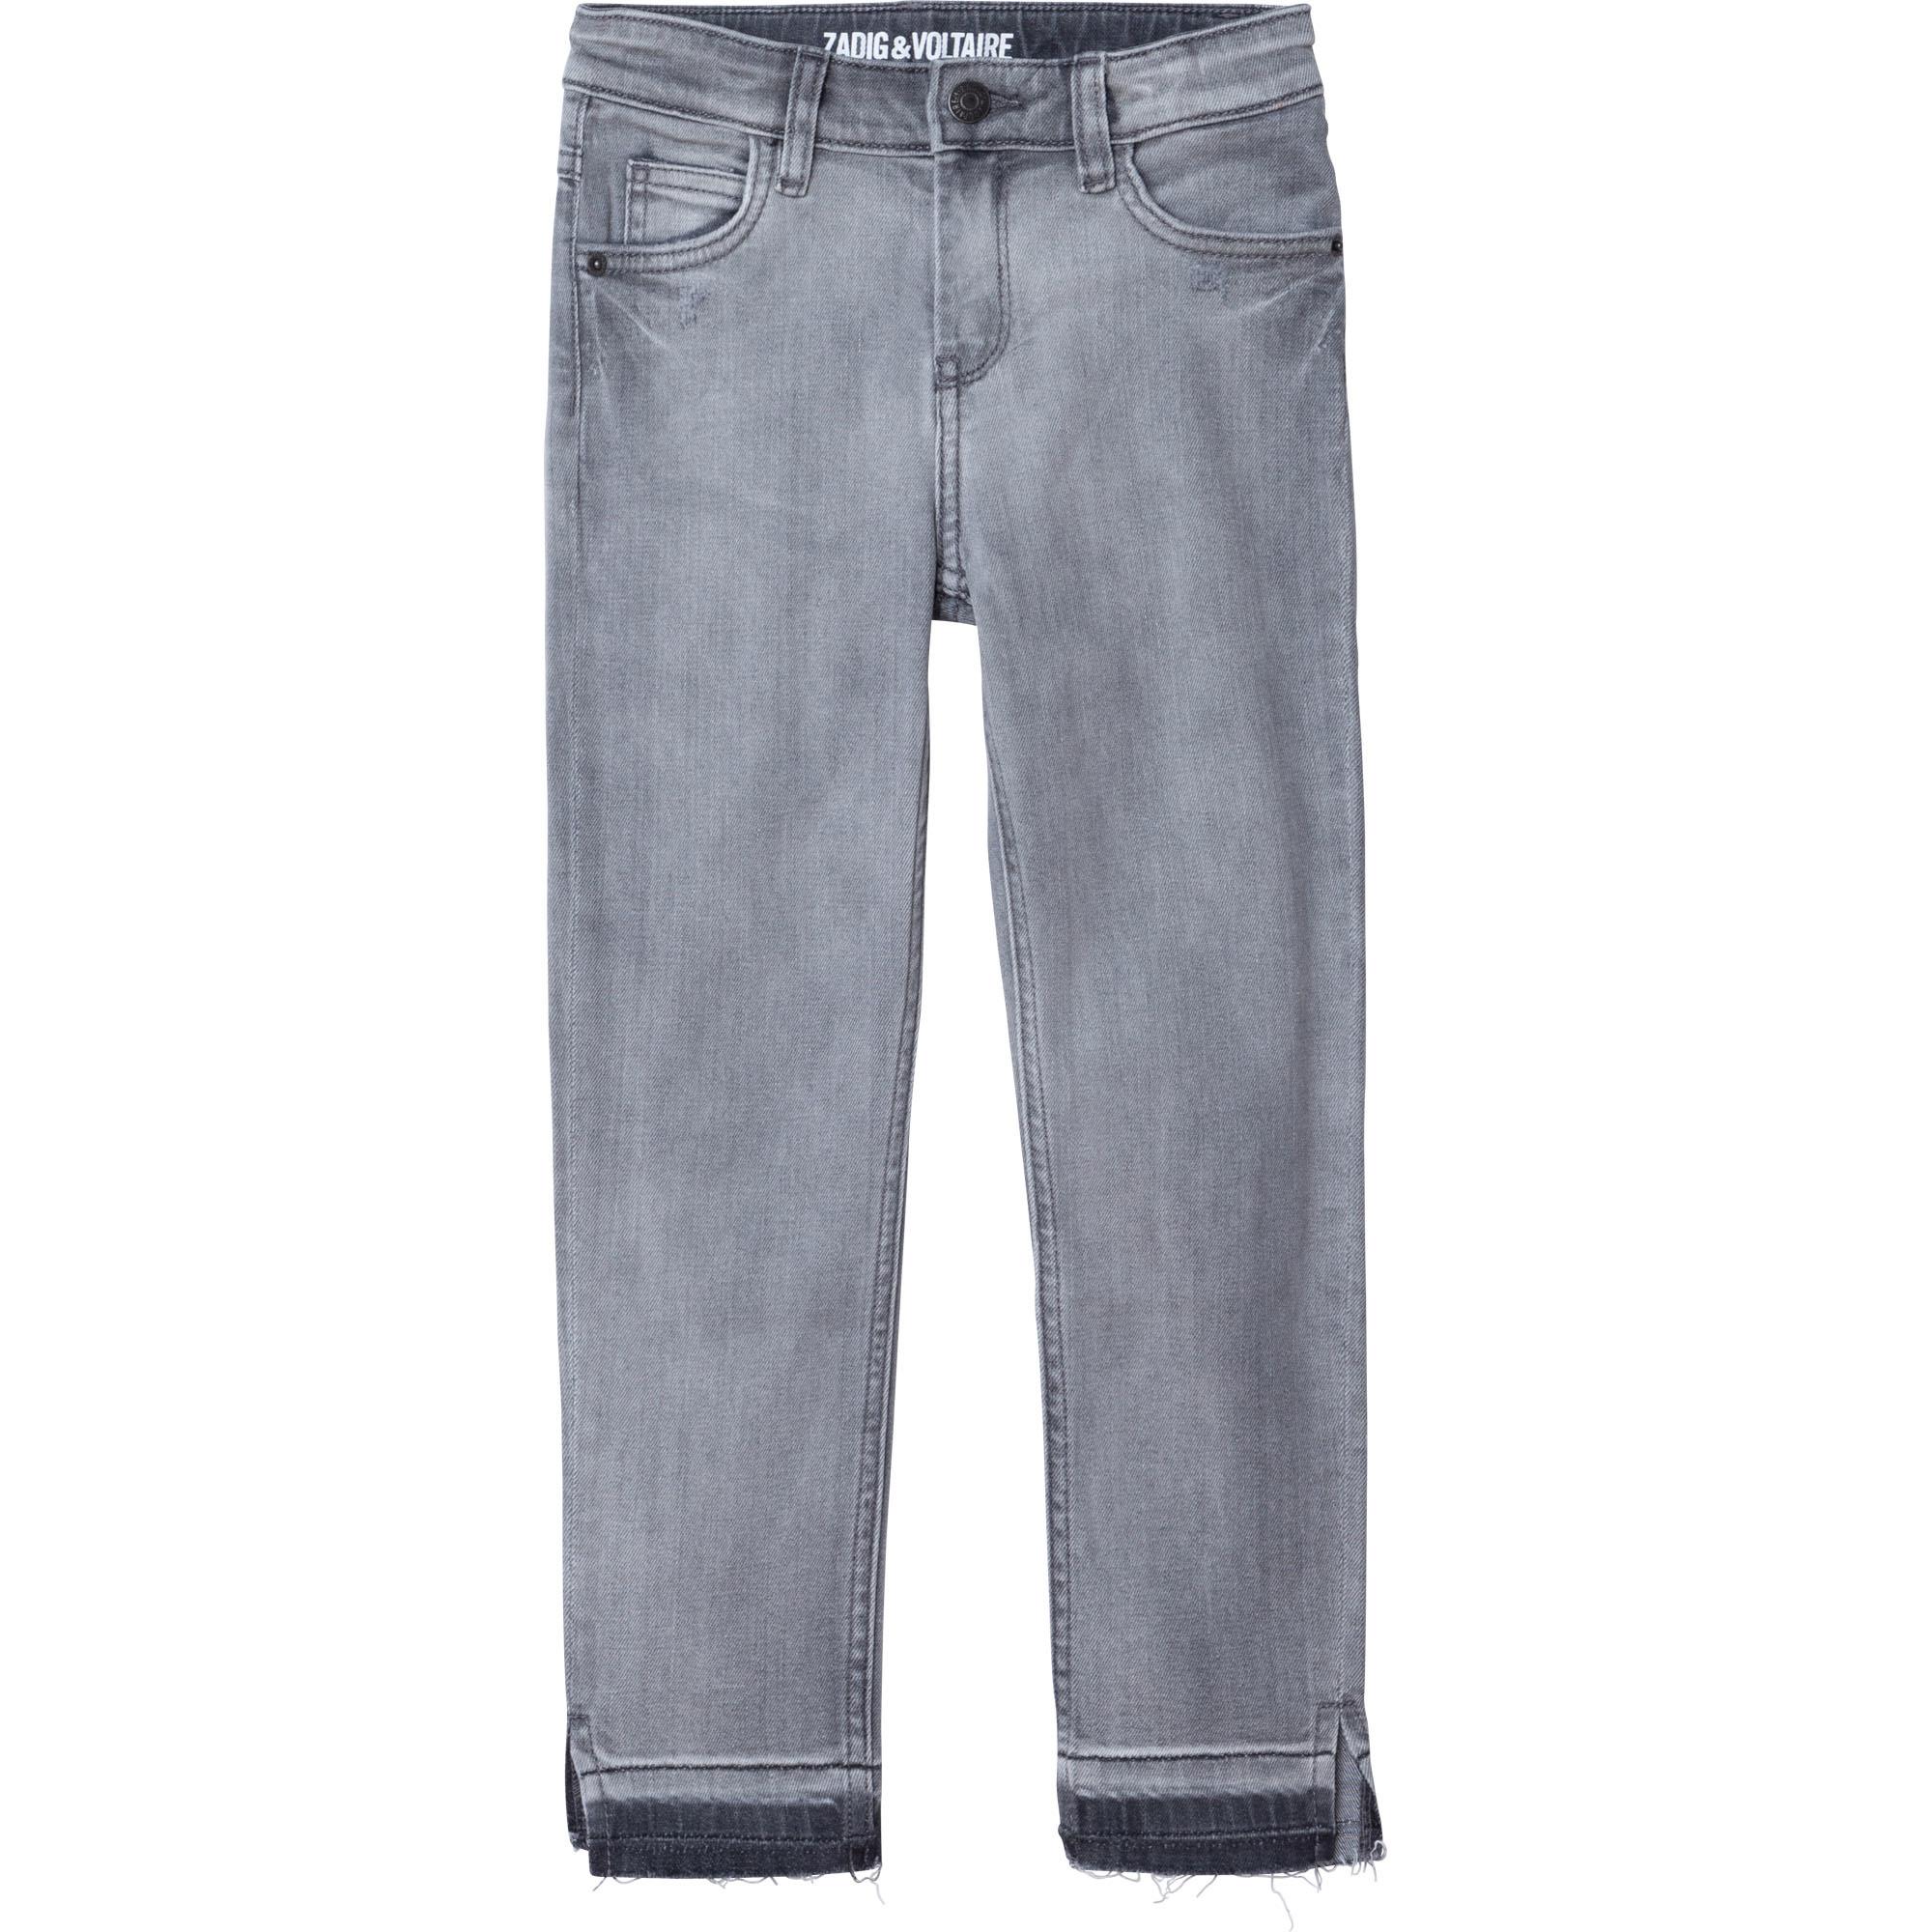 ZADIG&VOLTAIRE jean slim avec strass-1